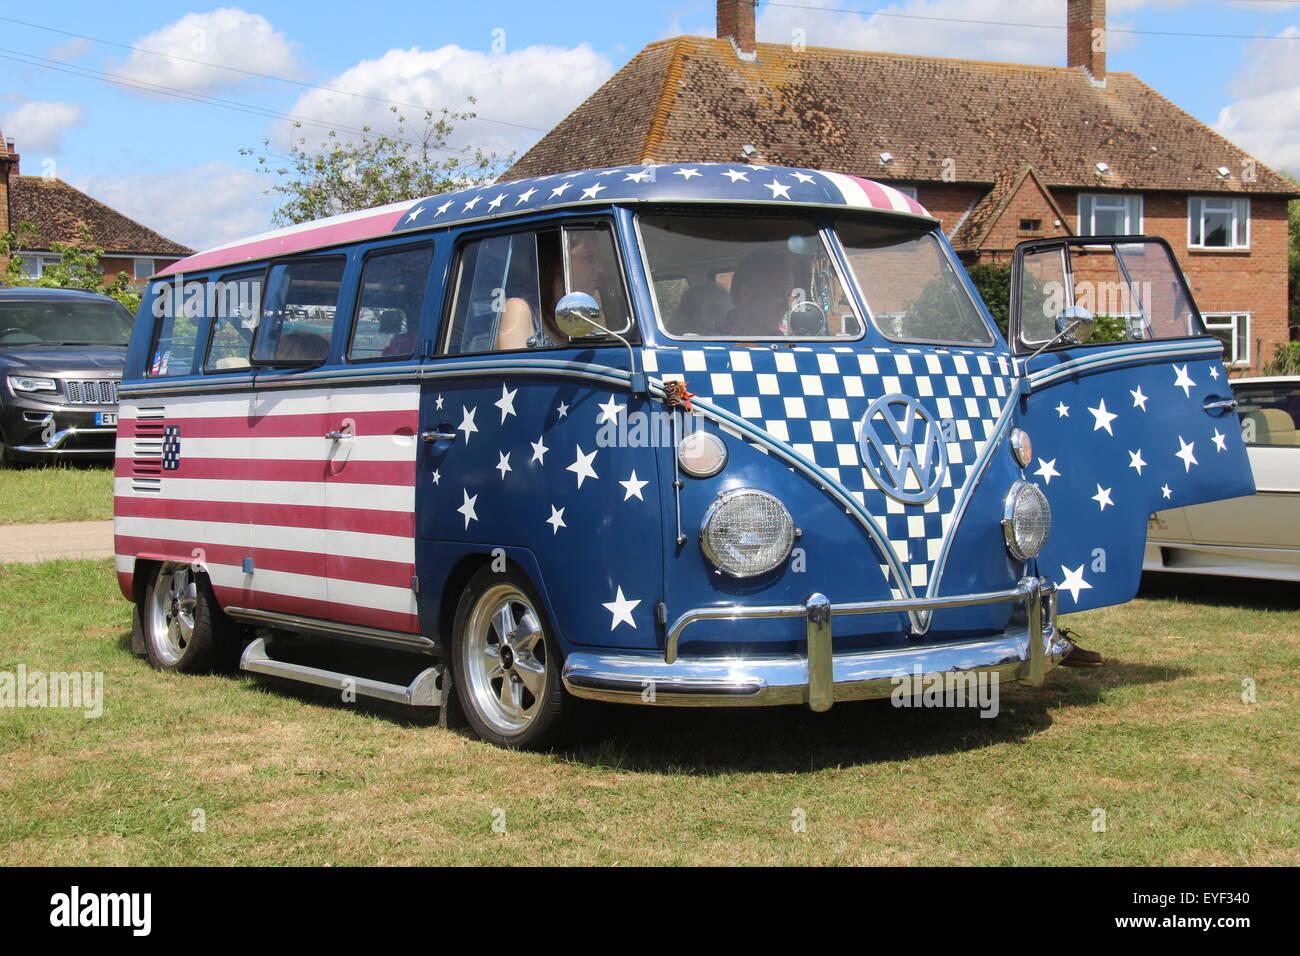 a vintage vw volkswagen split screen camper van bus in american usa stock photo royalty free. Black Bedroom Furniture Sets. Home Design Ideas